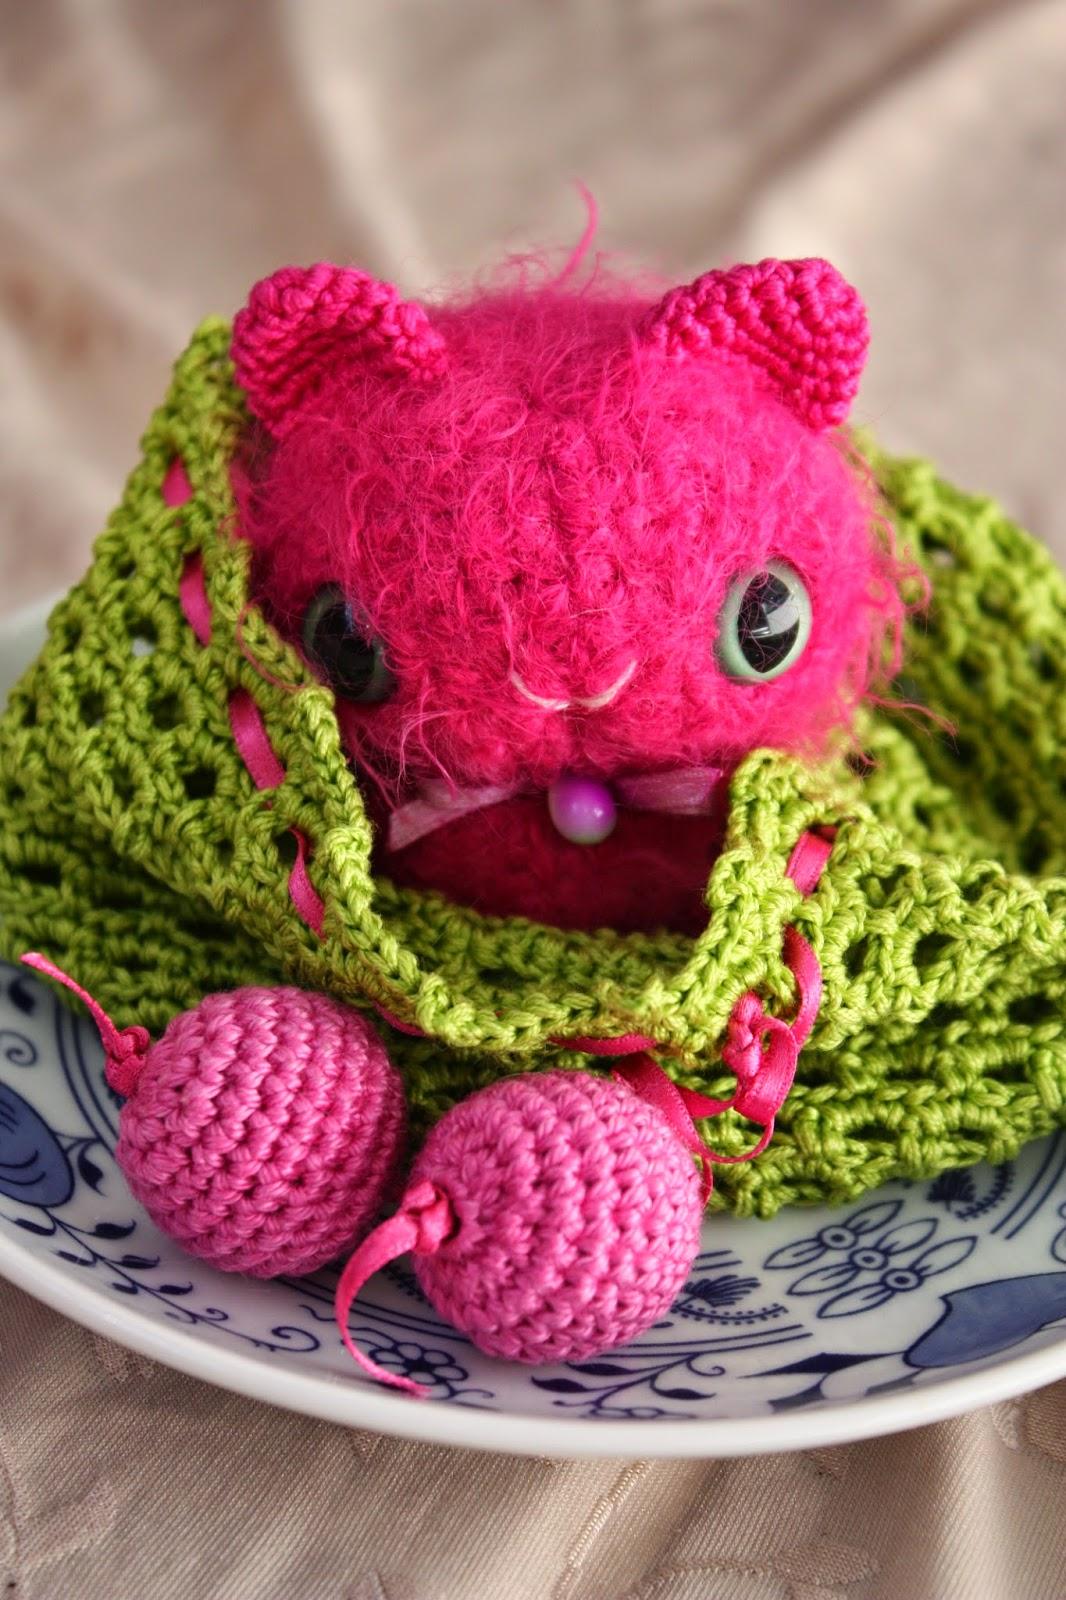 HAPPYAMIGURUMI: NEW PATTERN: Amigurumi Pearlcat with a Giftbag